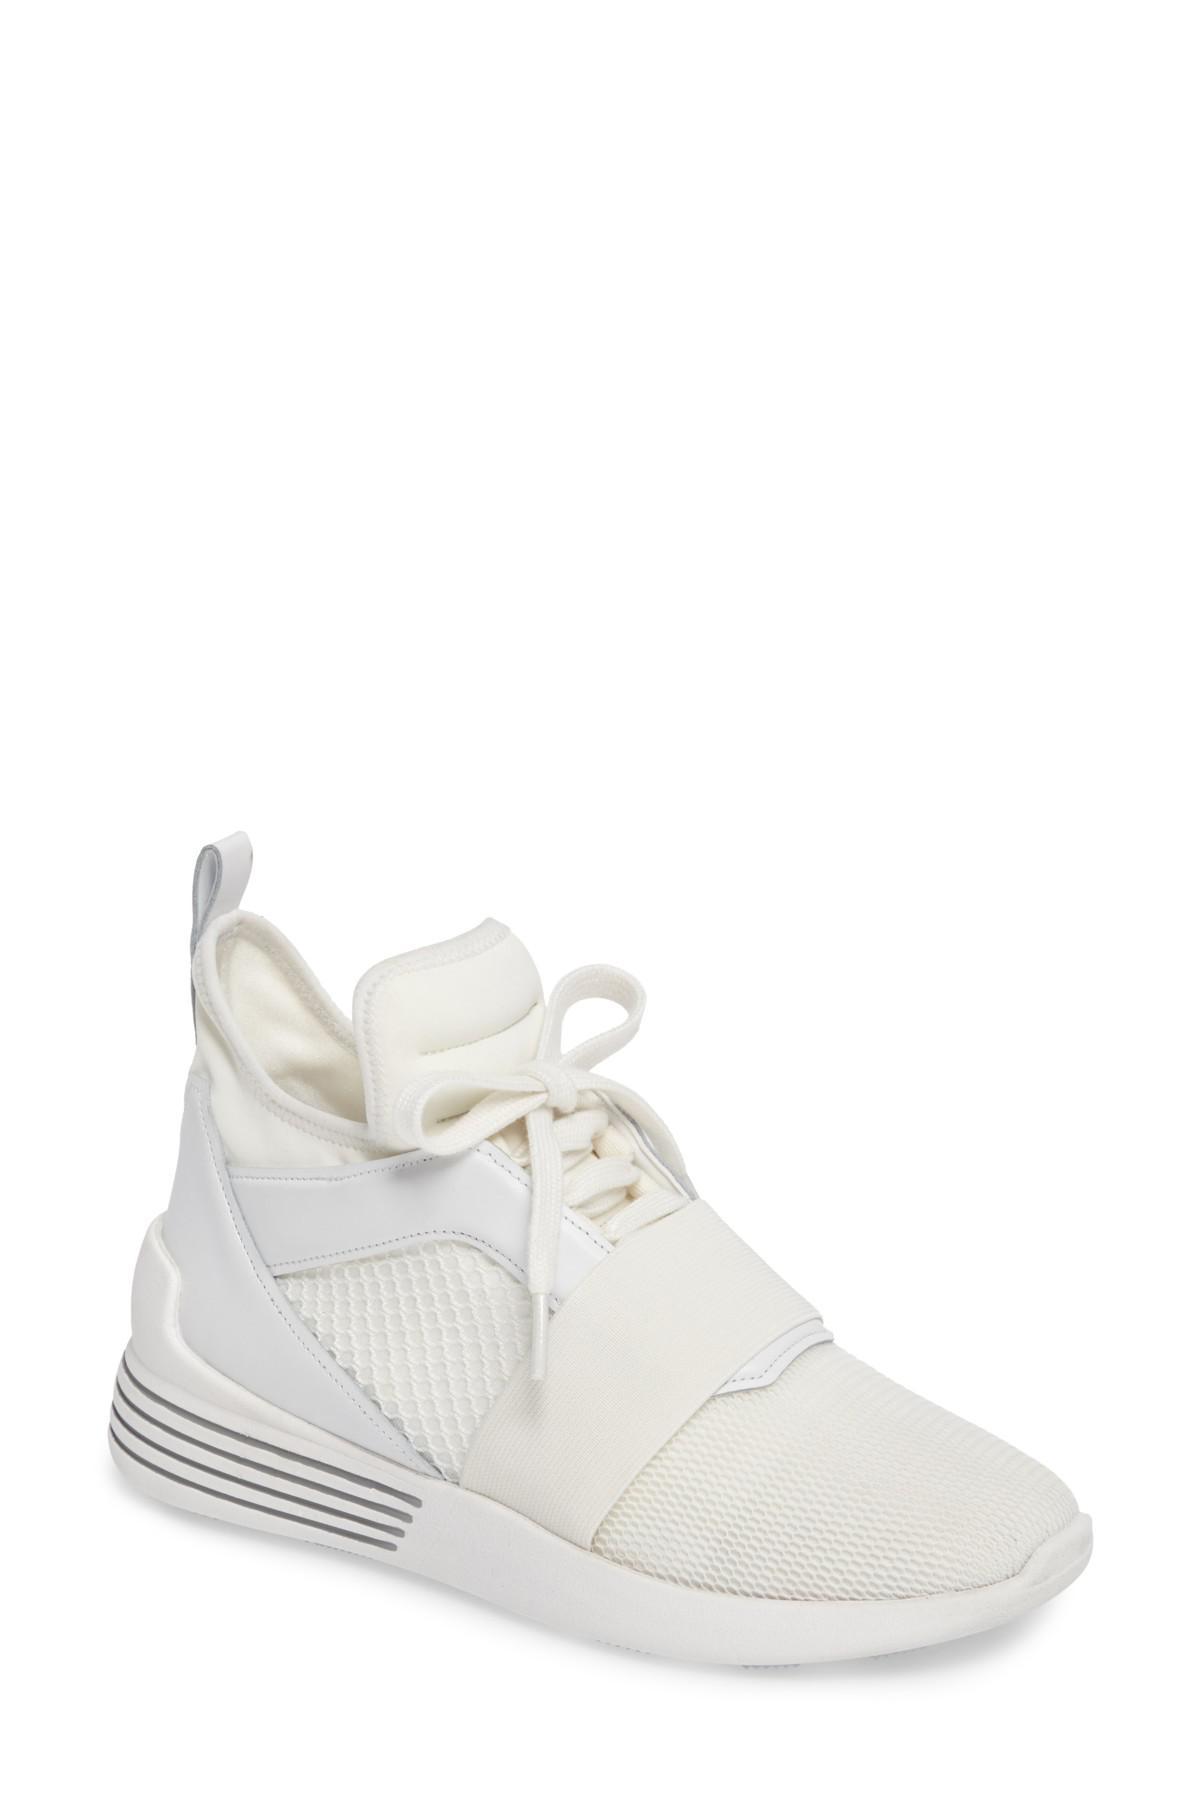 44e513439 Kendall + Kylie Braydin Hidden Wedge Sneaker in White - Lyst